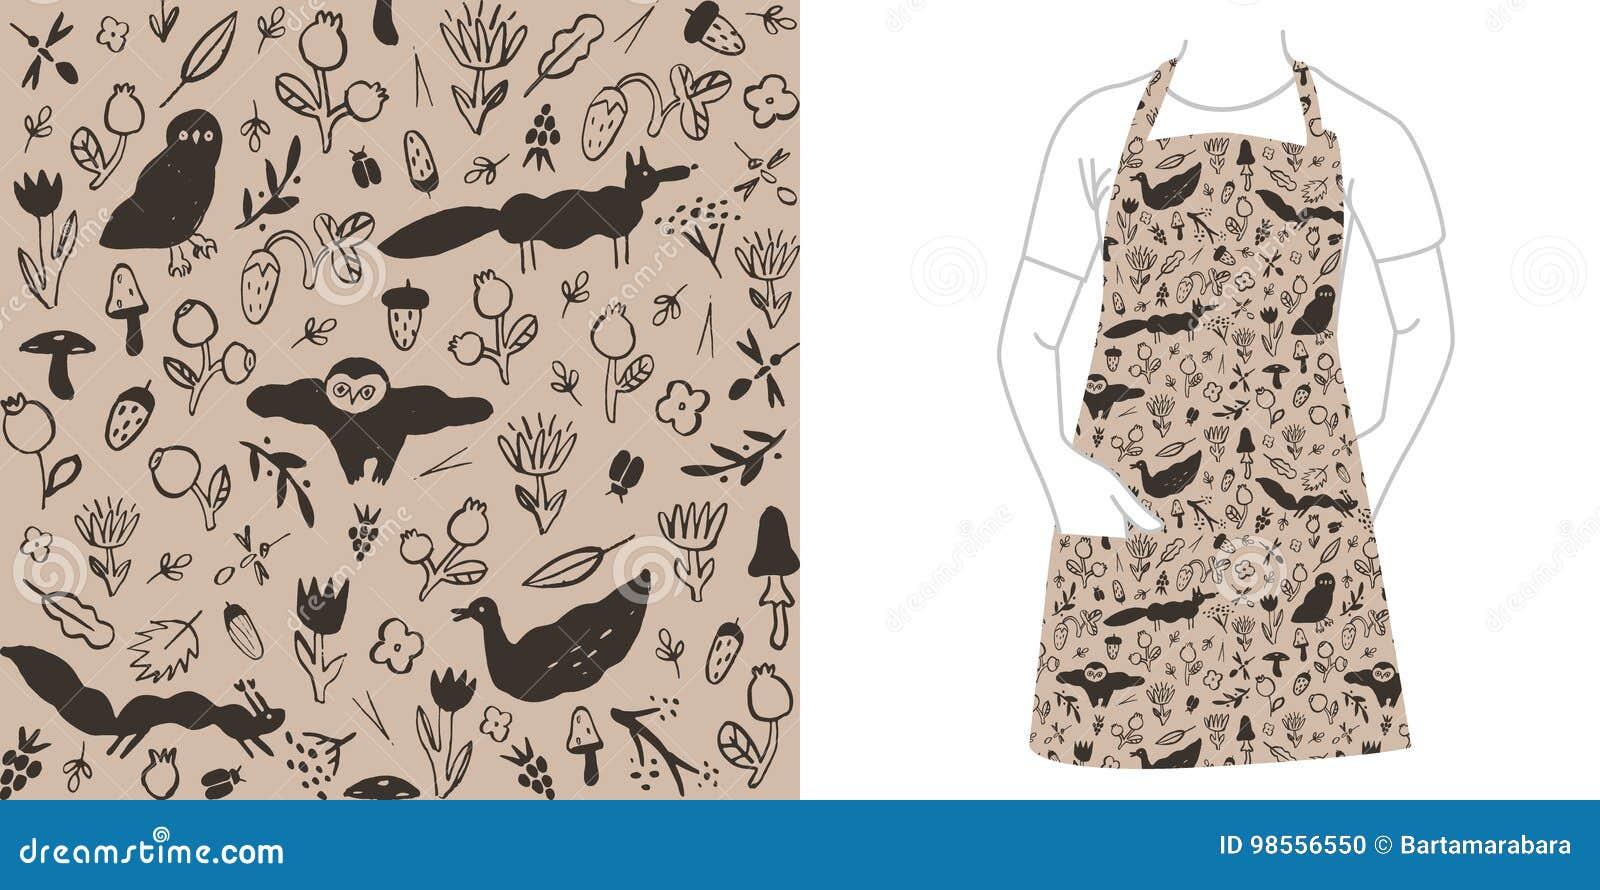 Nahtloses schwarzes Muster mit wilden Tieren, Blumen, Beeren, Pilzen und Insekten